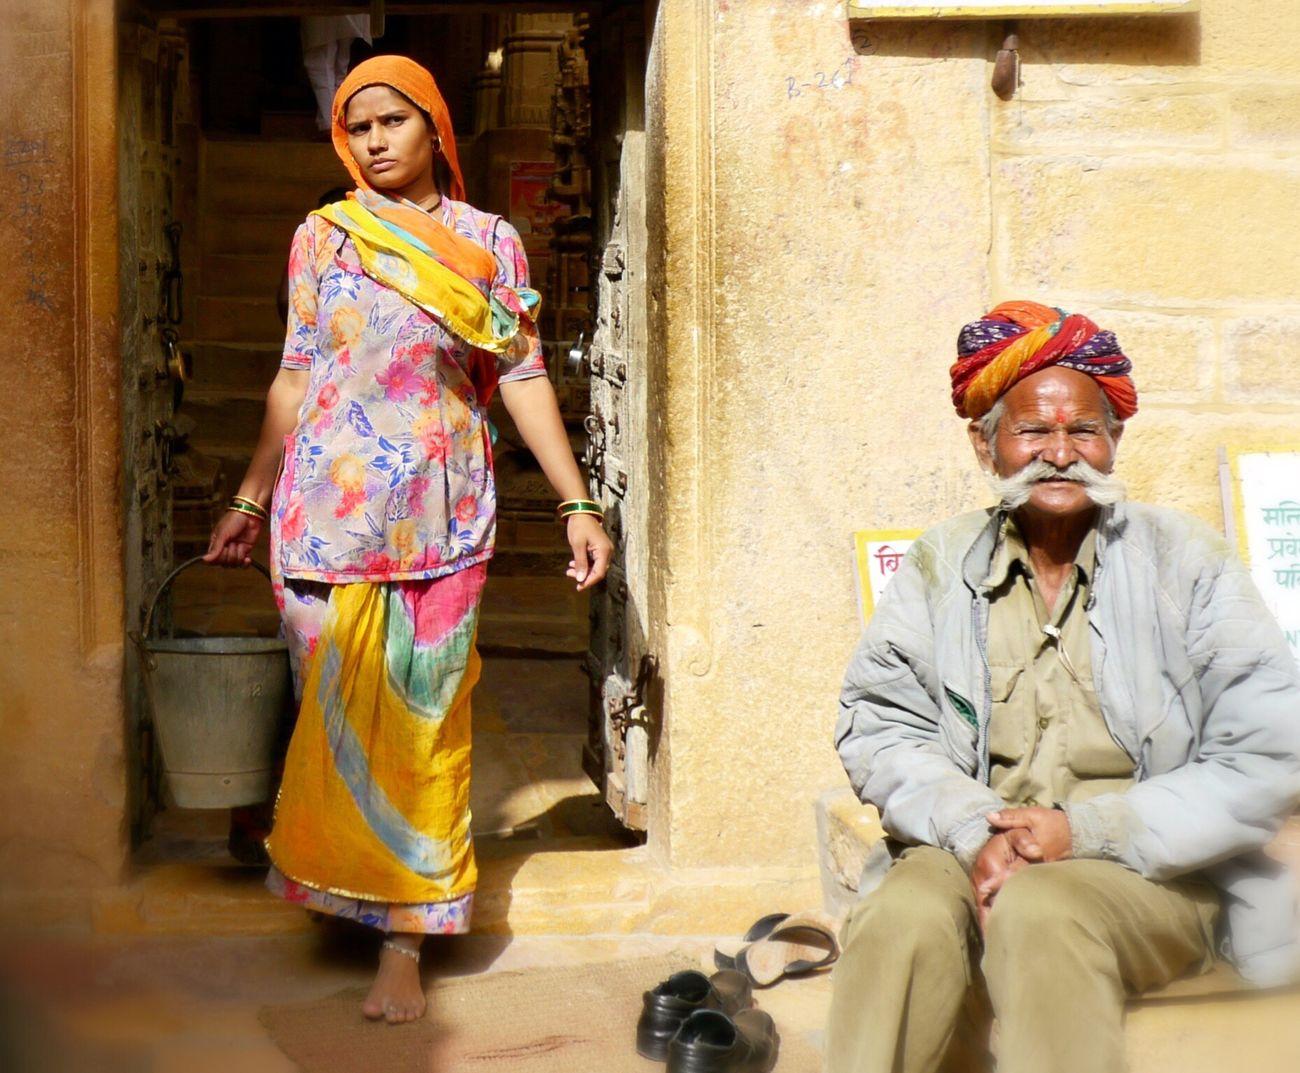 Inde Rajshtan India old Old Man Young Women